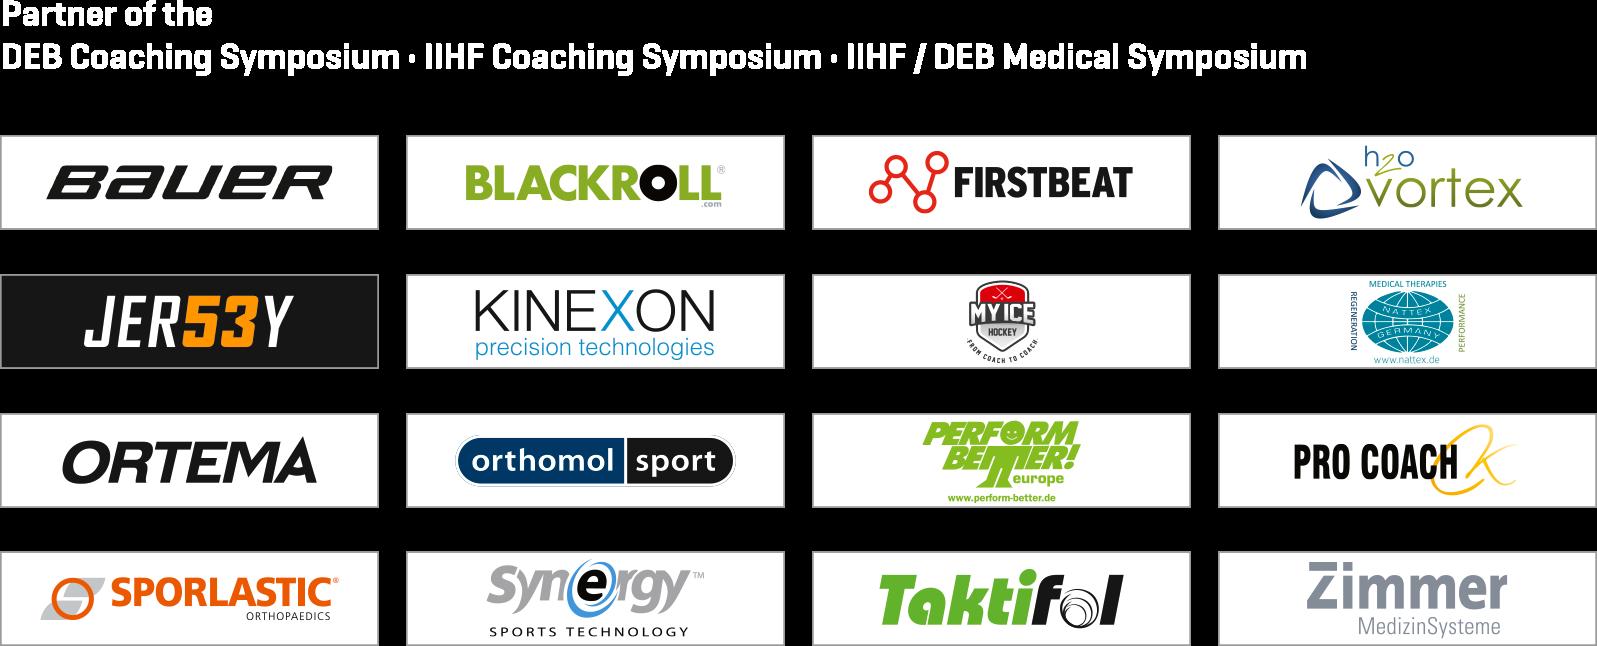 2017 IIHF Eishockey WM Symposium Partner